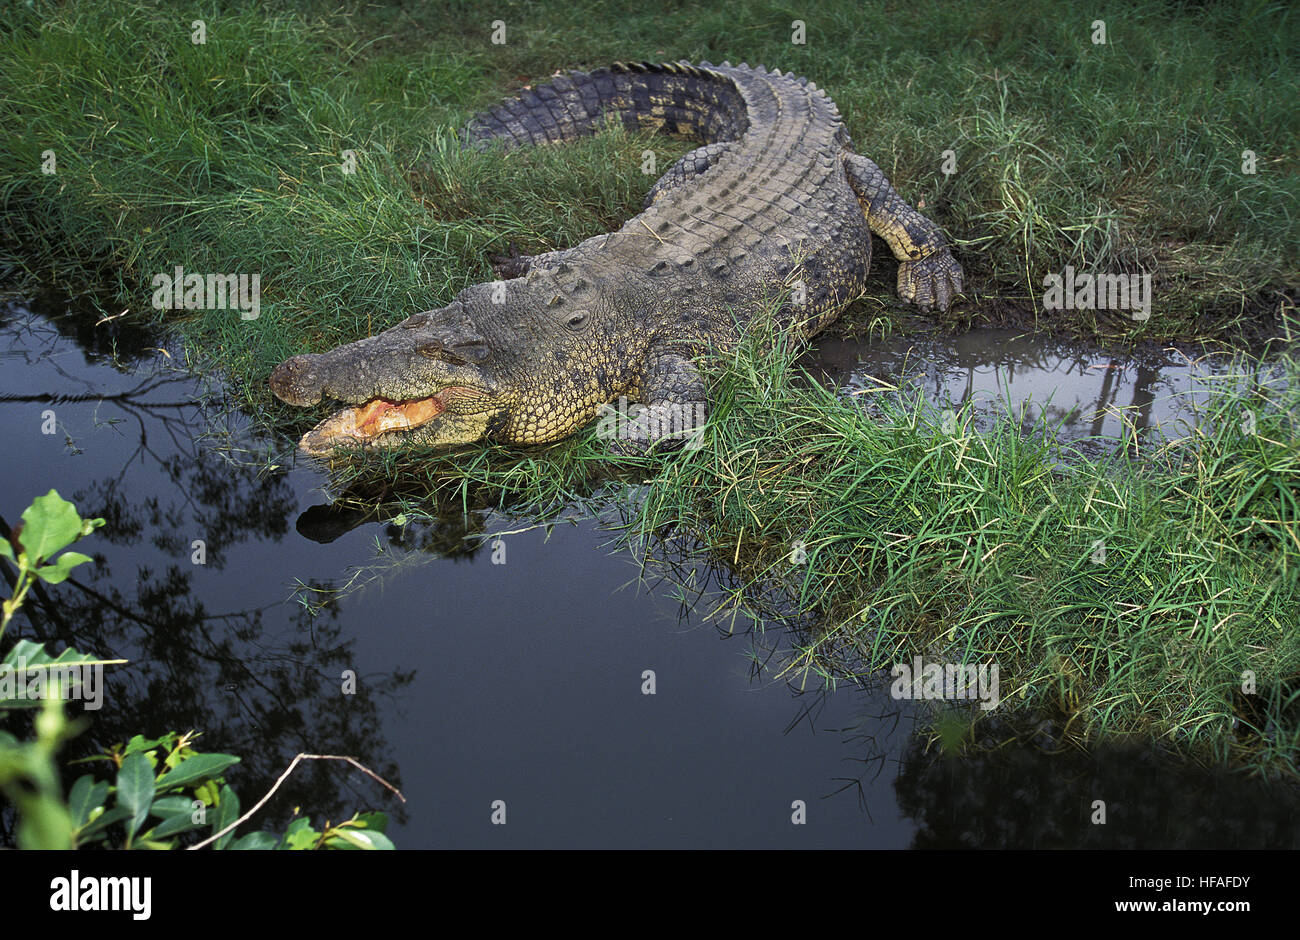 Australian Saltwater Crocodile or Estuarine Crocodile, crocodylus porosus, Adult with Open Mouth Regulating Body - Stock Image